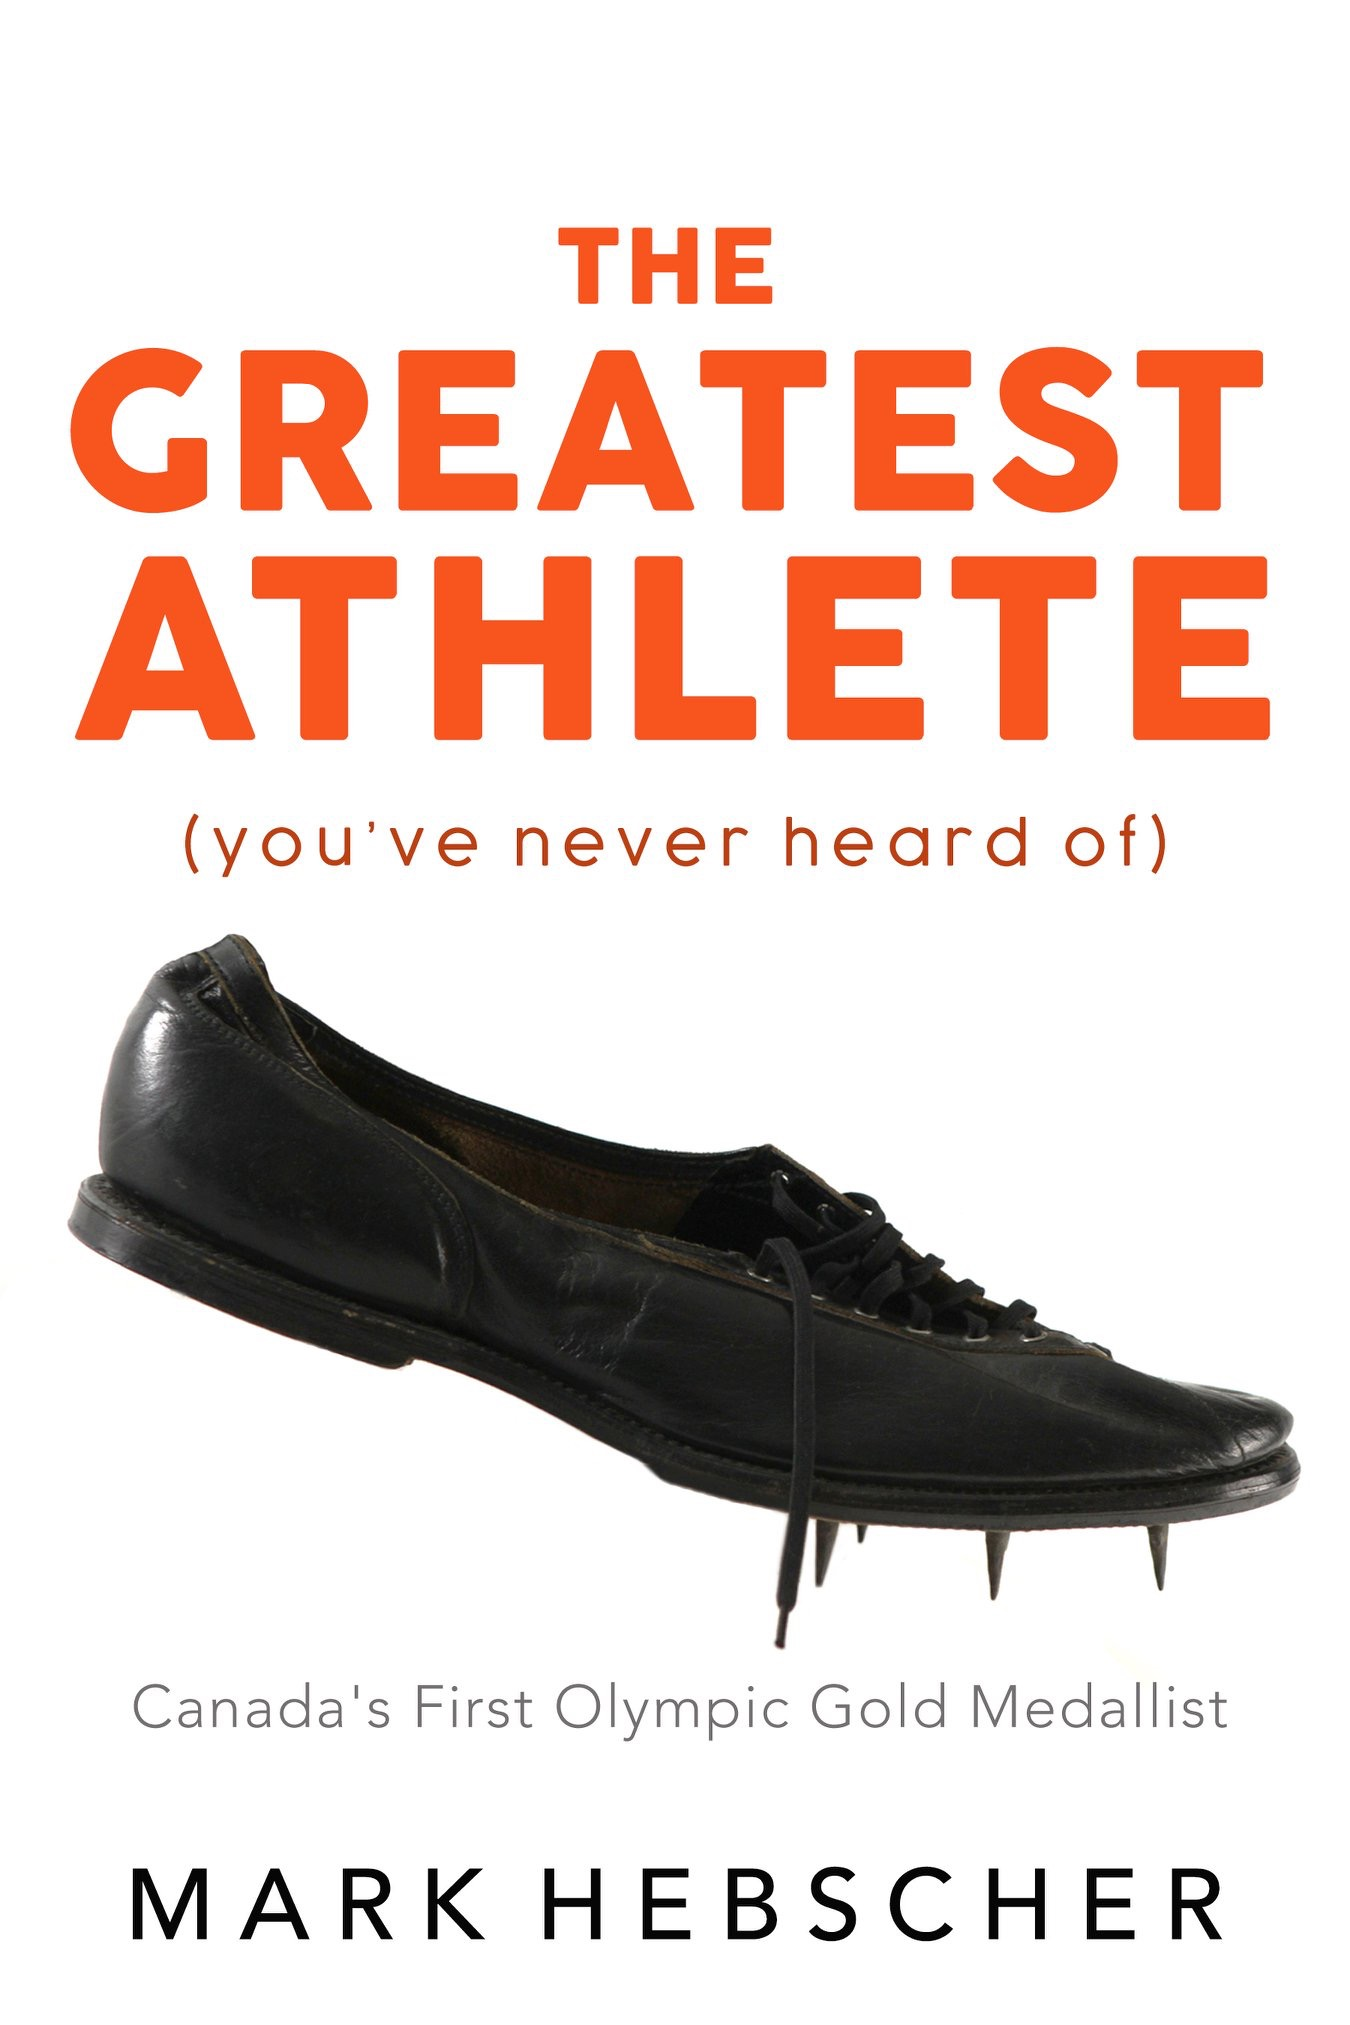 The Greatest Athlete